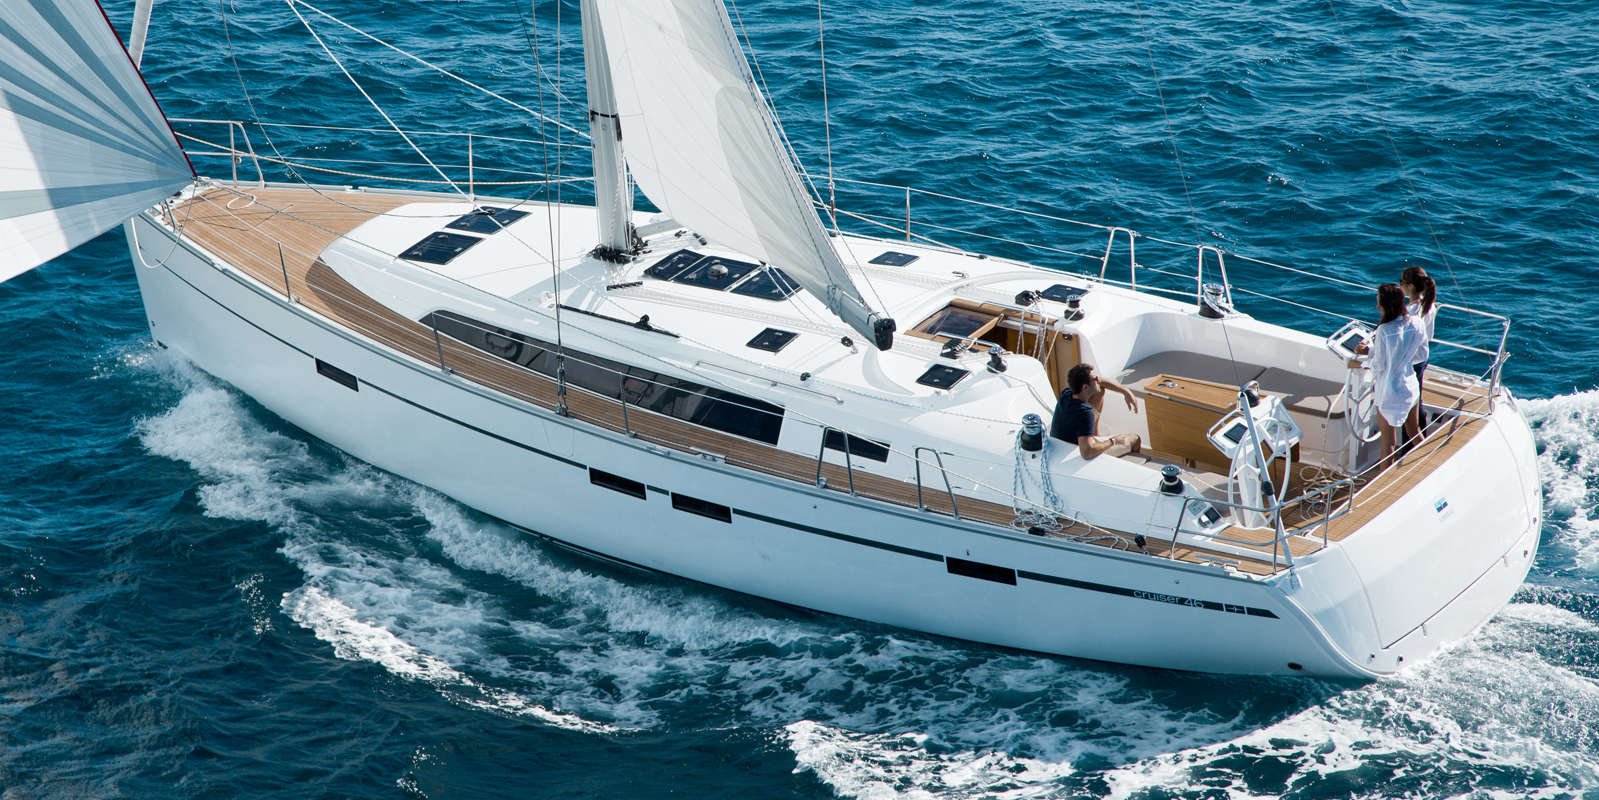 Puntea-Terasa-Inchiriere-Petreceri-Croaziere-Vacante-Yacht-Bavaria-Cruise46_2